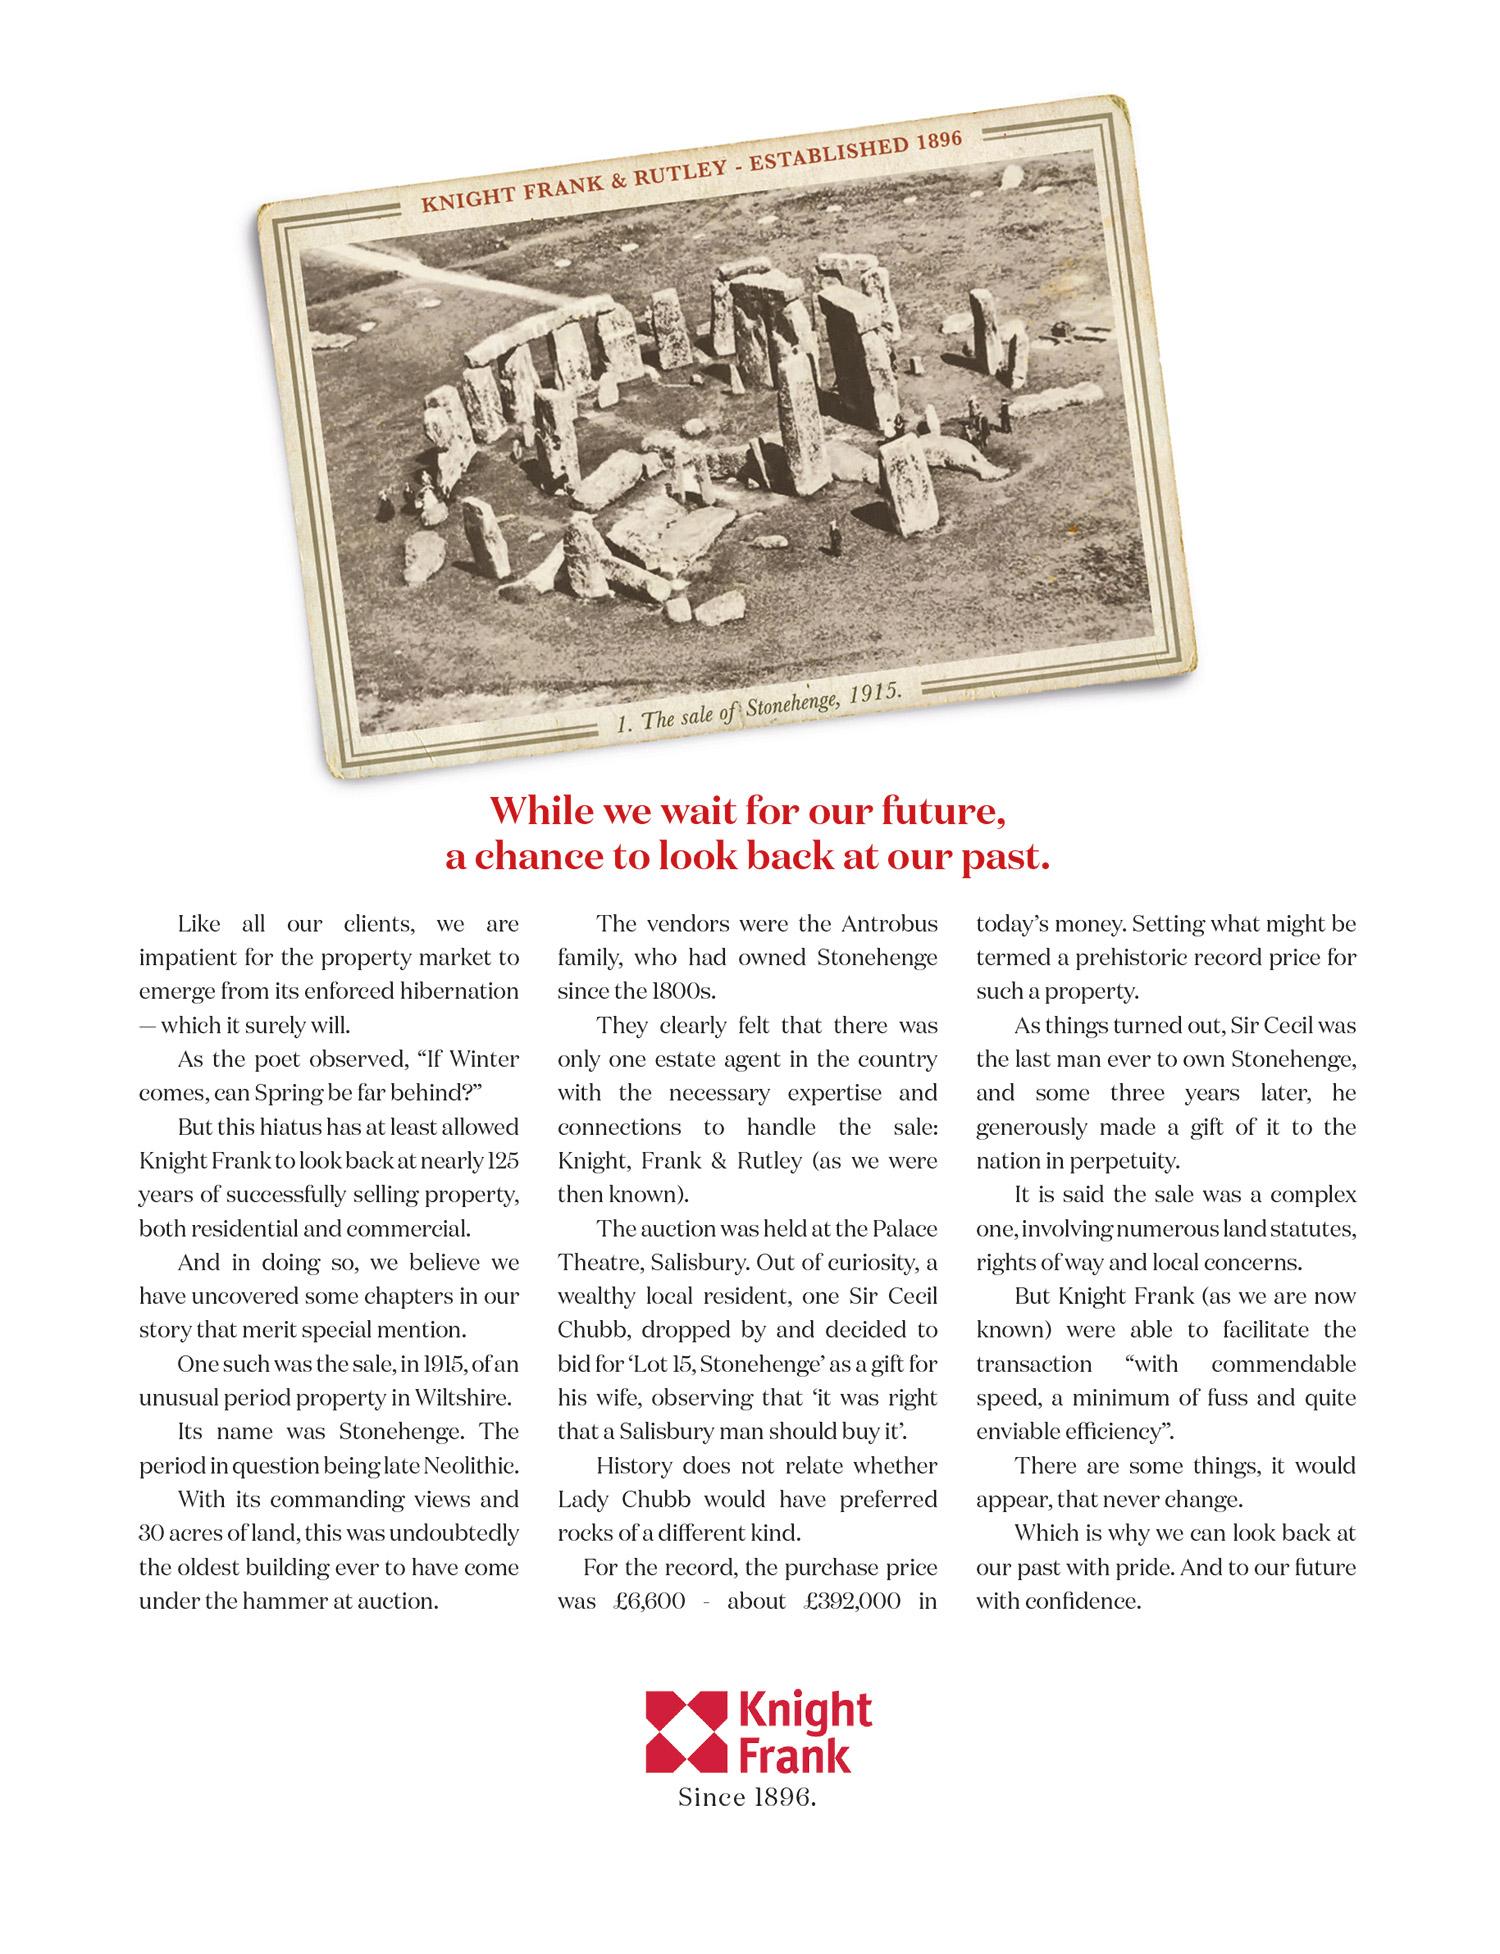 Knight Frank Sale of Stonehenge